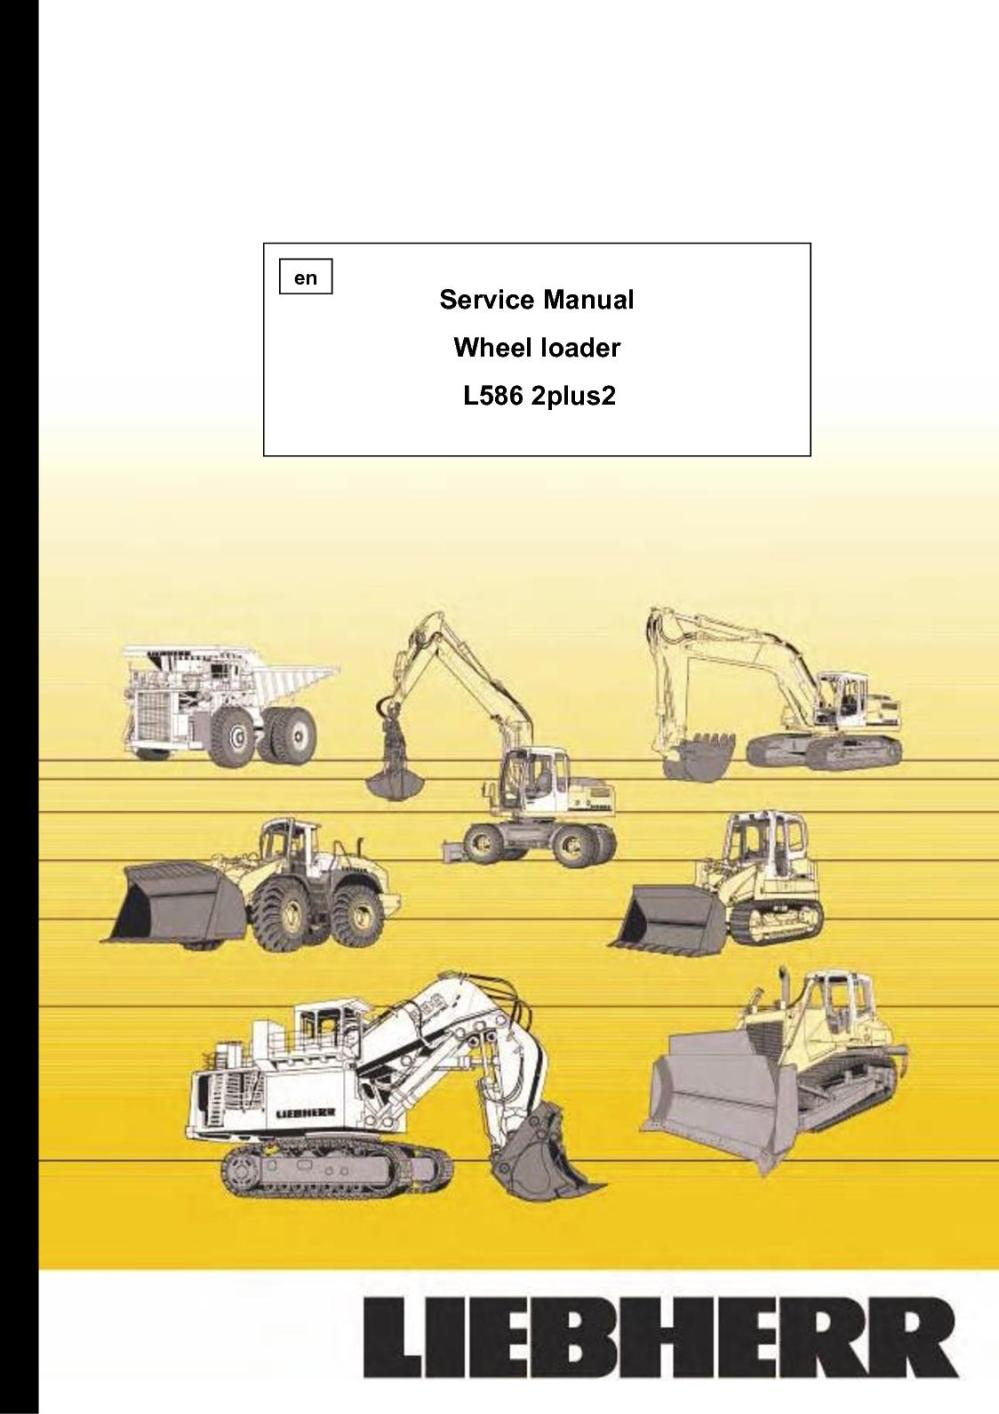 medium resolution of liebherr l586 2plus2 wheel loader service repair manual